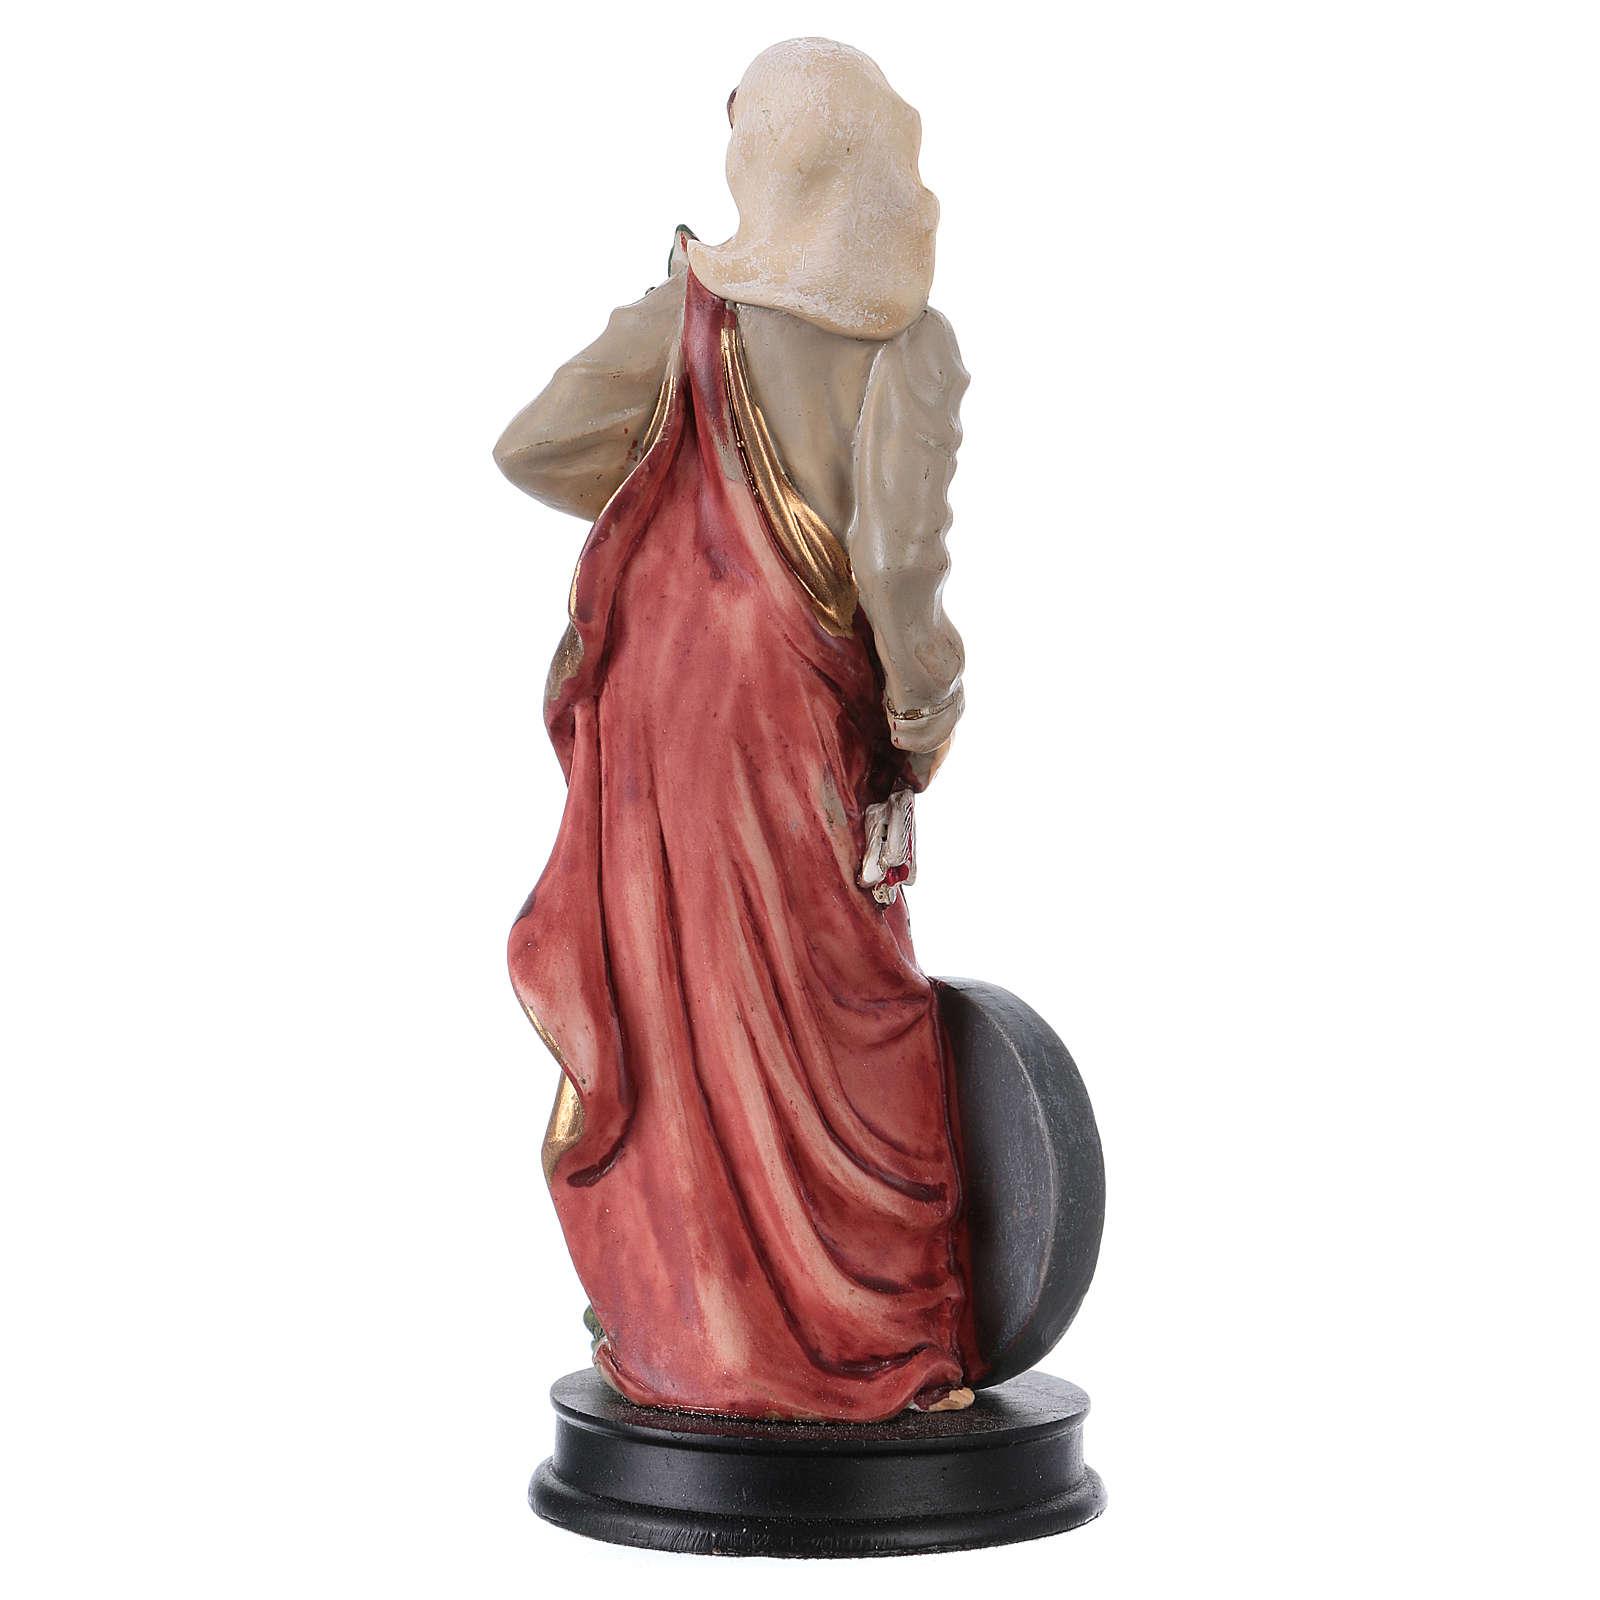 STOCK resin Saint Christina statue 13 cm 4